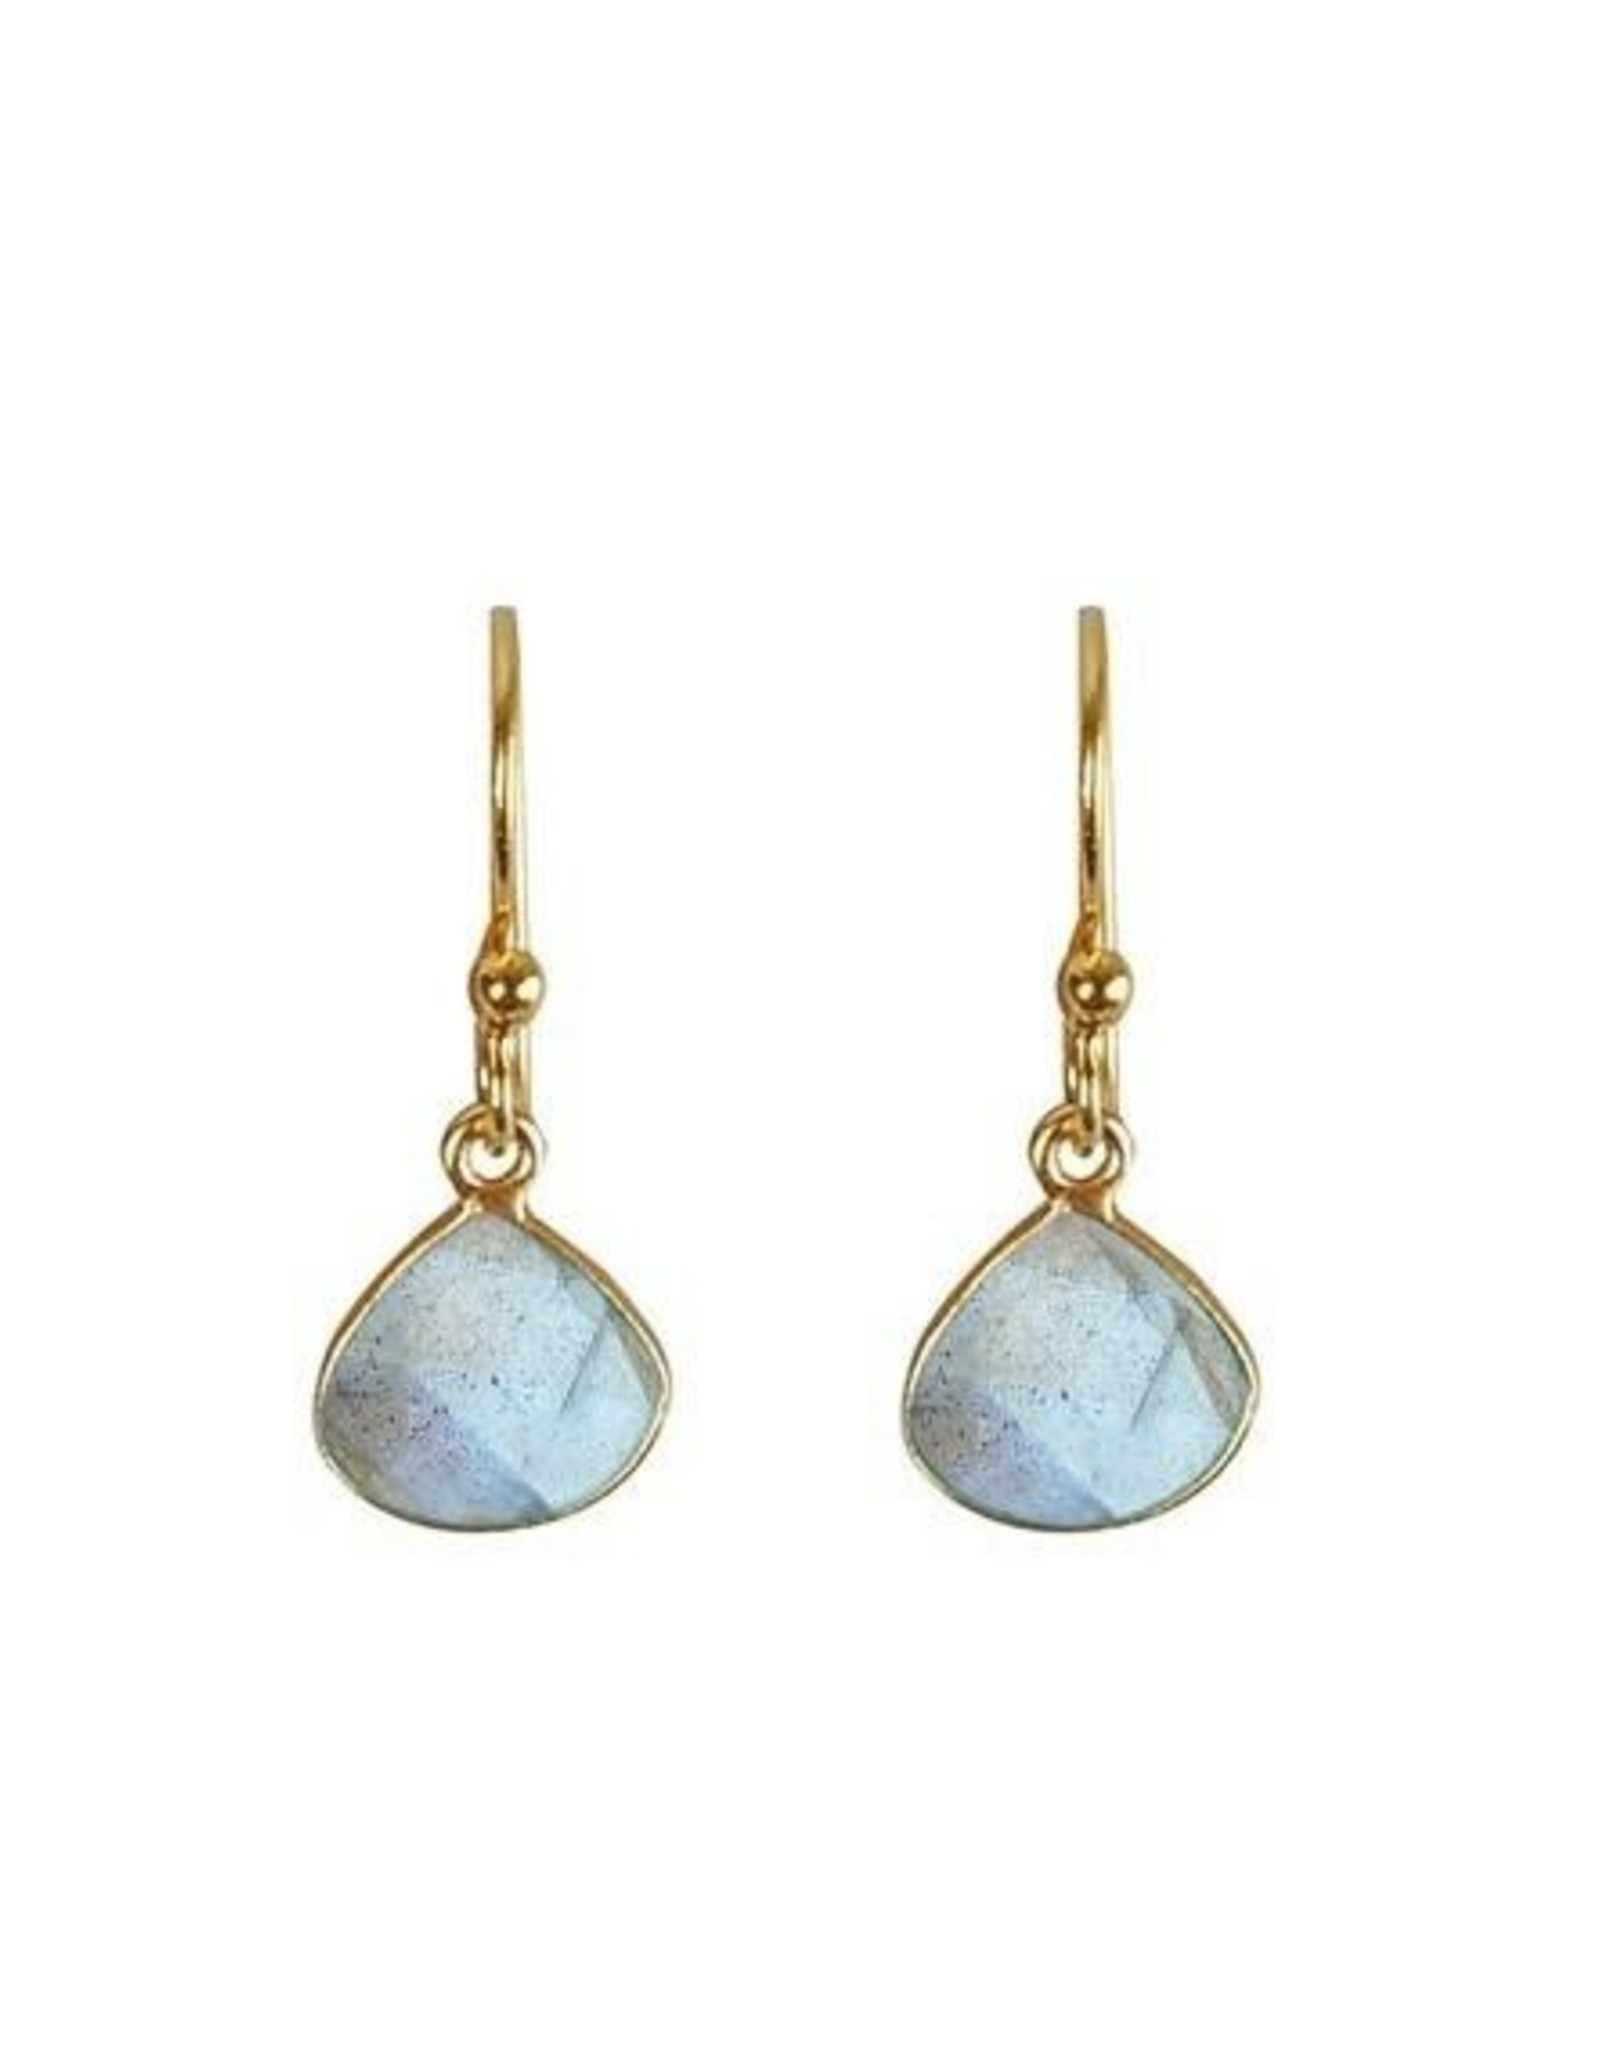 Ohrringe Small Drop Stone Labradorit 925 Silber vergoldet